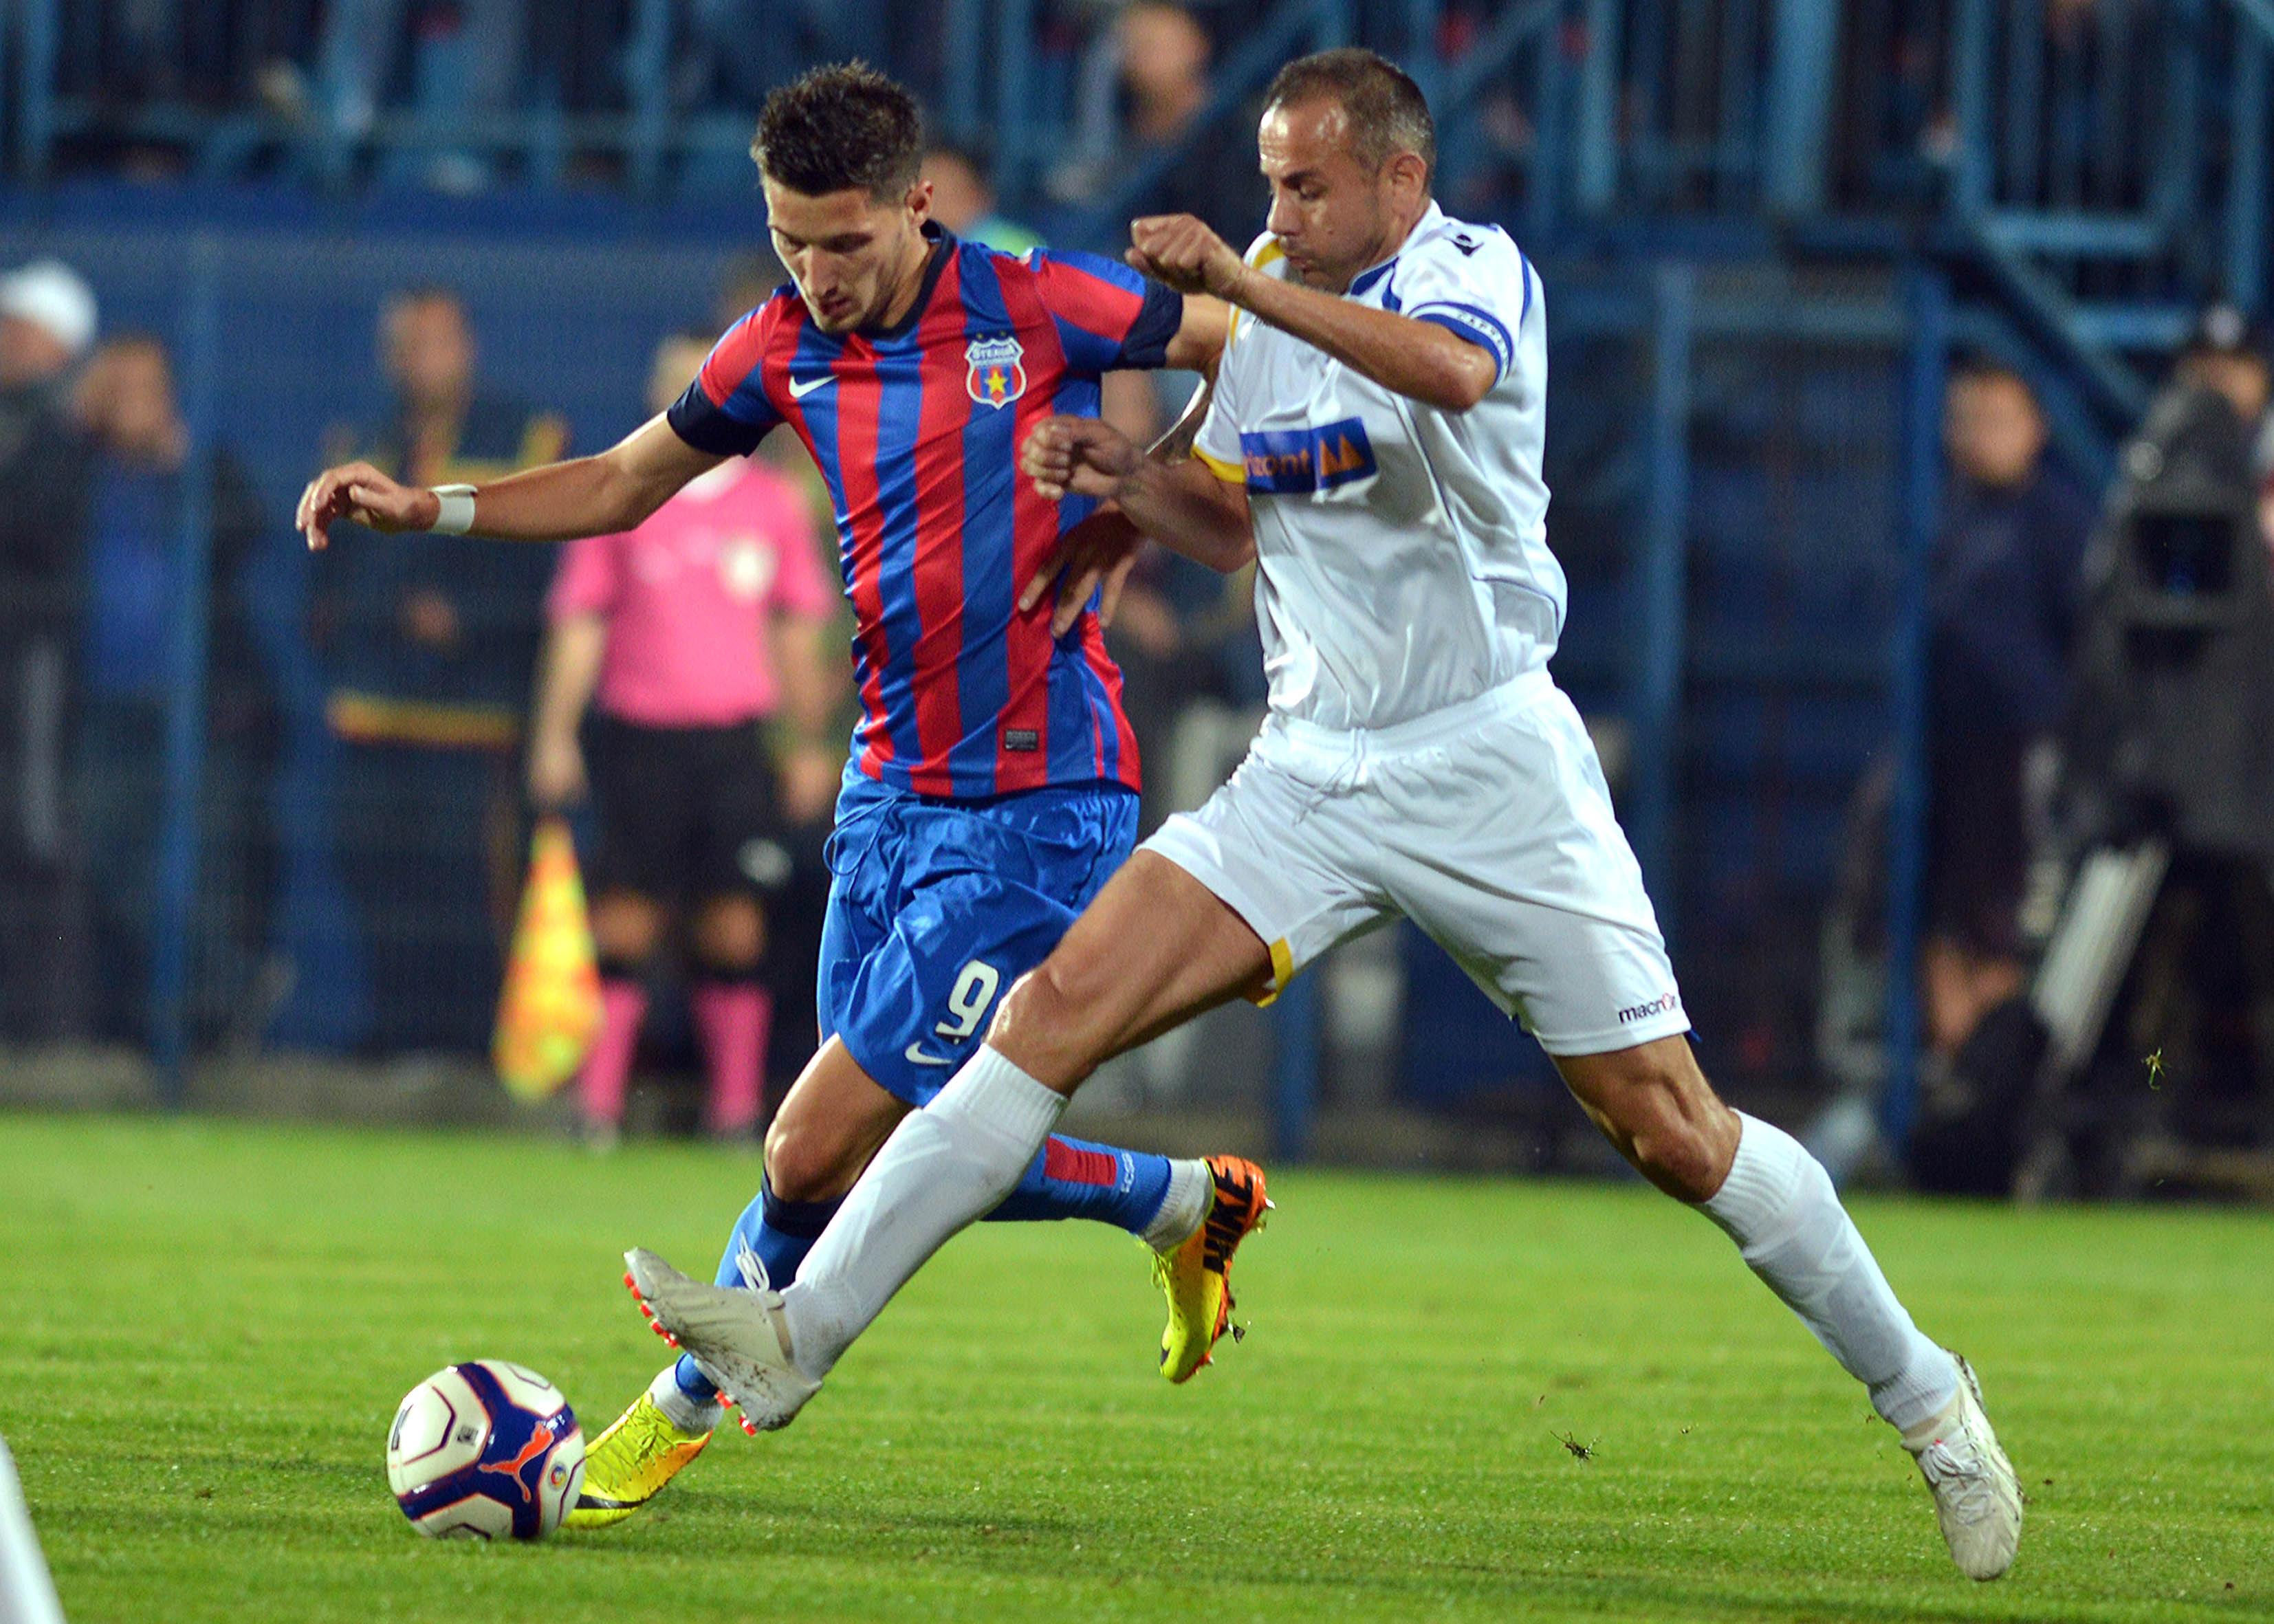 2.FOTBAL:STEAUA BUCURESTI-AVANTUL BARSANA 1-0,CUPA ROMANIEI TIMISOREANA (26.09.2013)